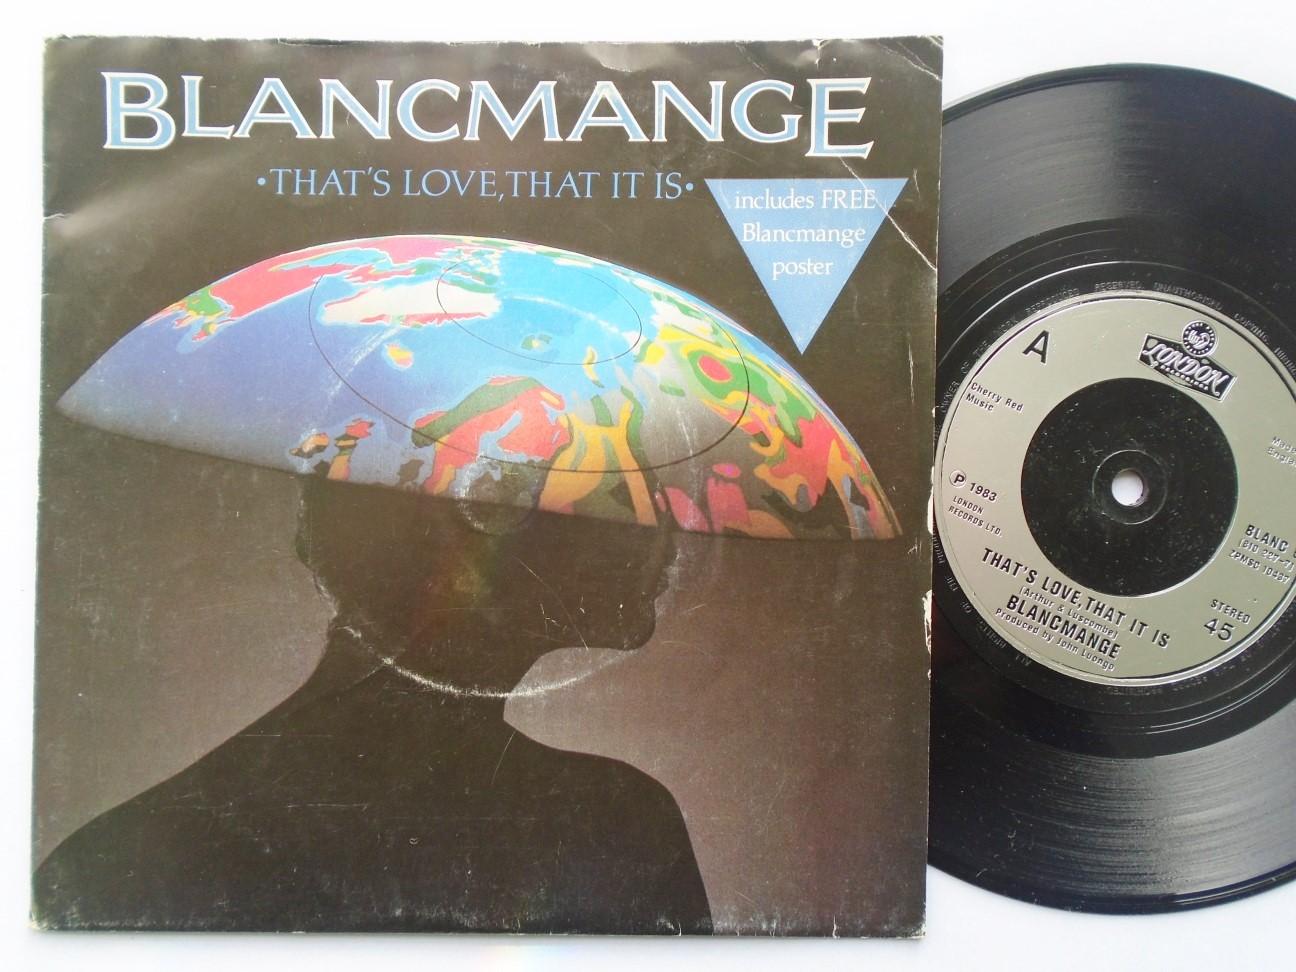 Blancmange - That's Love That It Is/vishnu Album